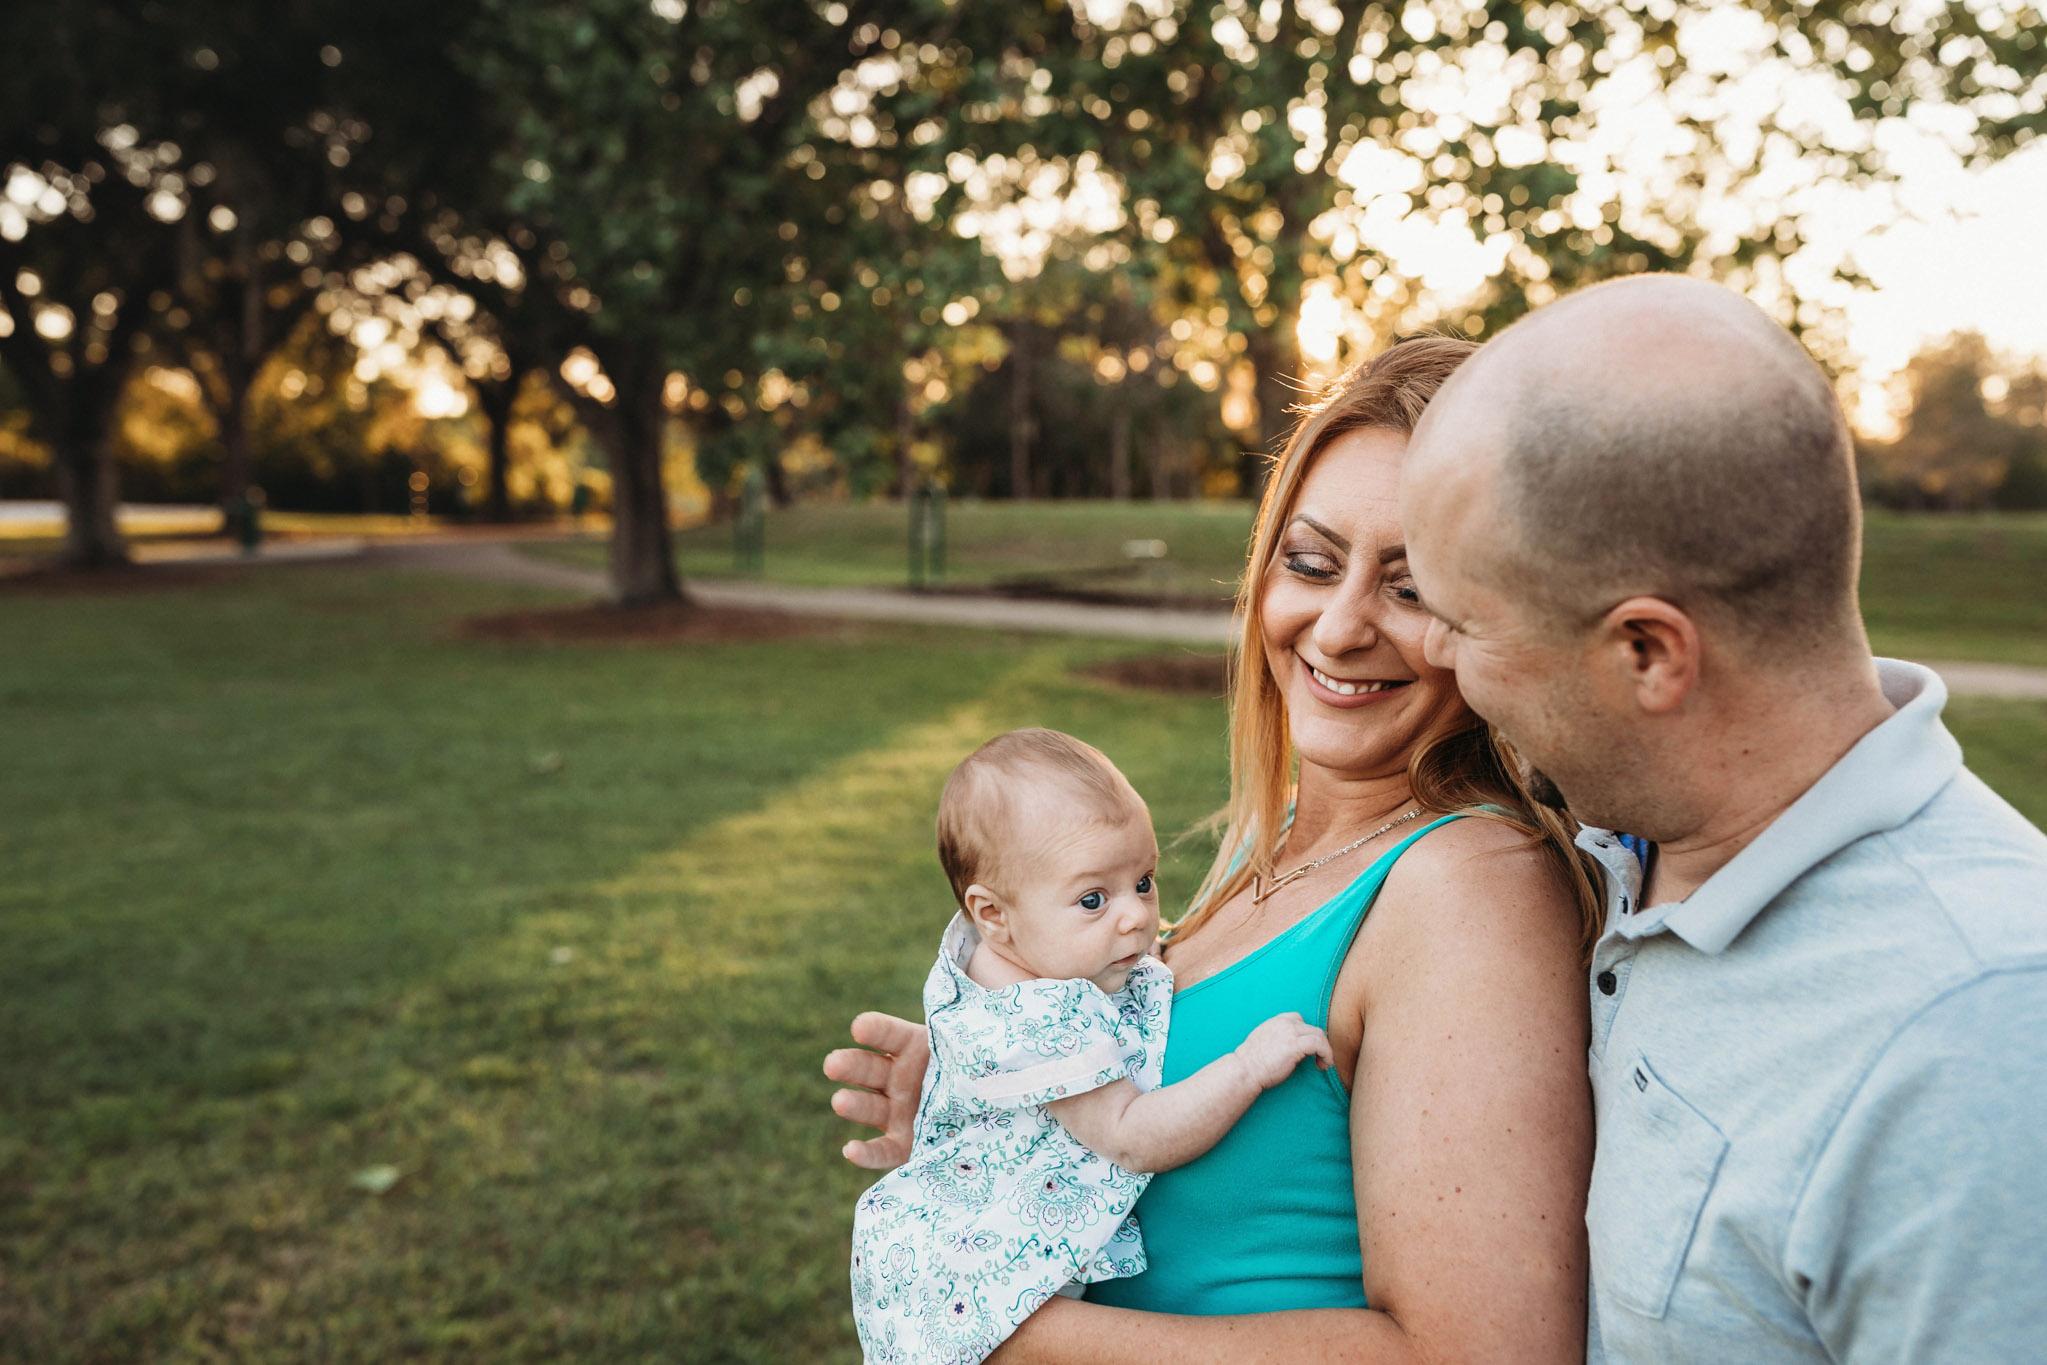 Tampa Family Photographer_Jennifer Kielich Photography_Knott for blog-15.jpg